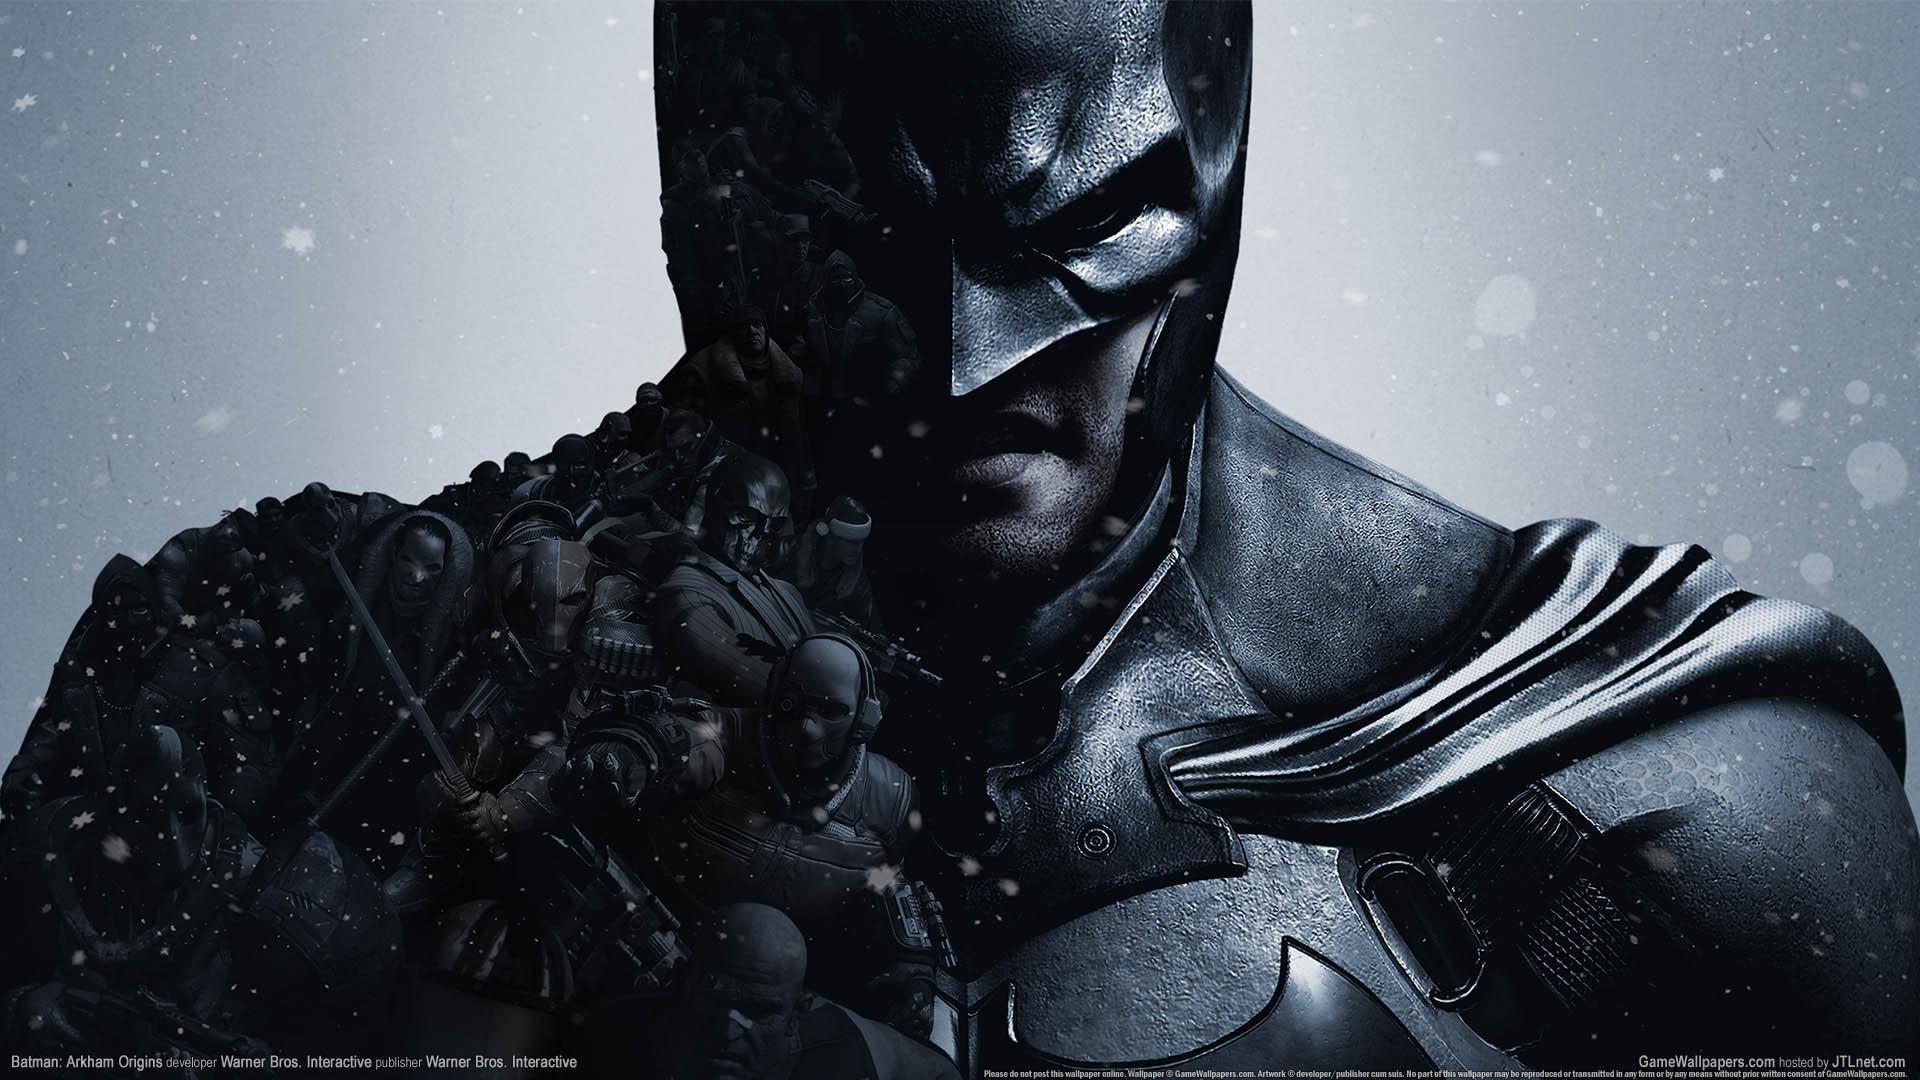 … Batman: Arkham Origins wallpaper or background 02